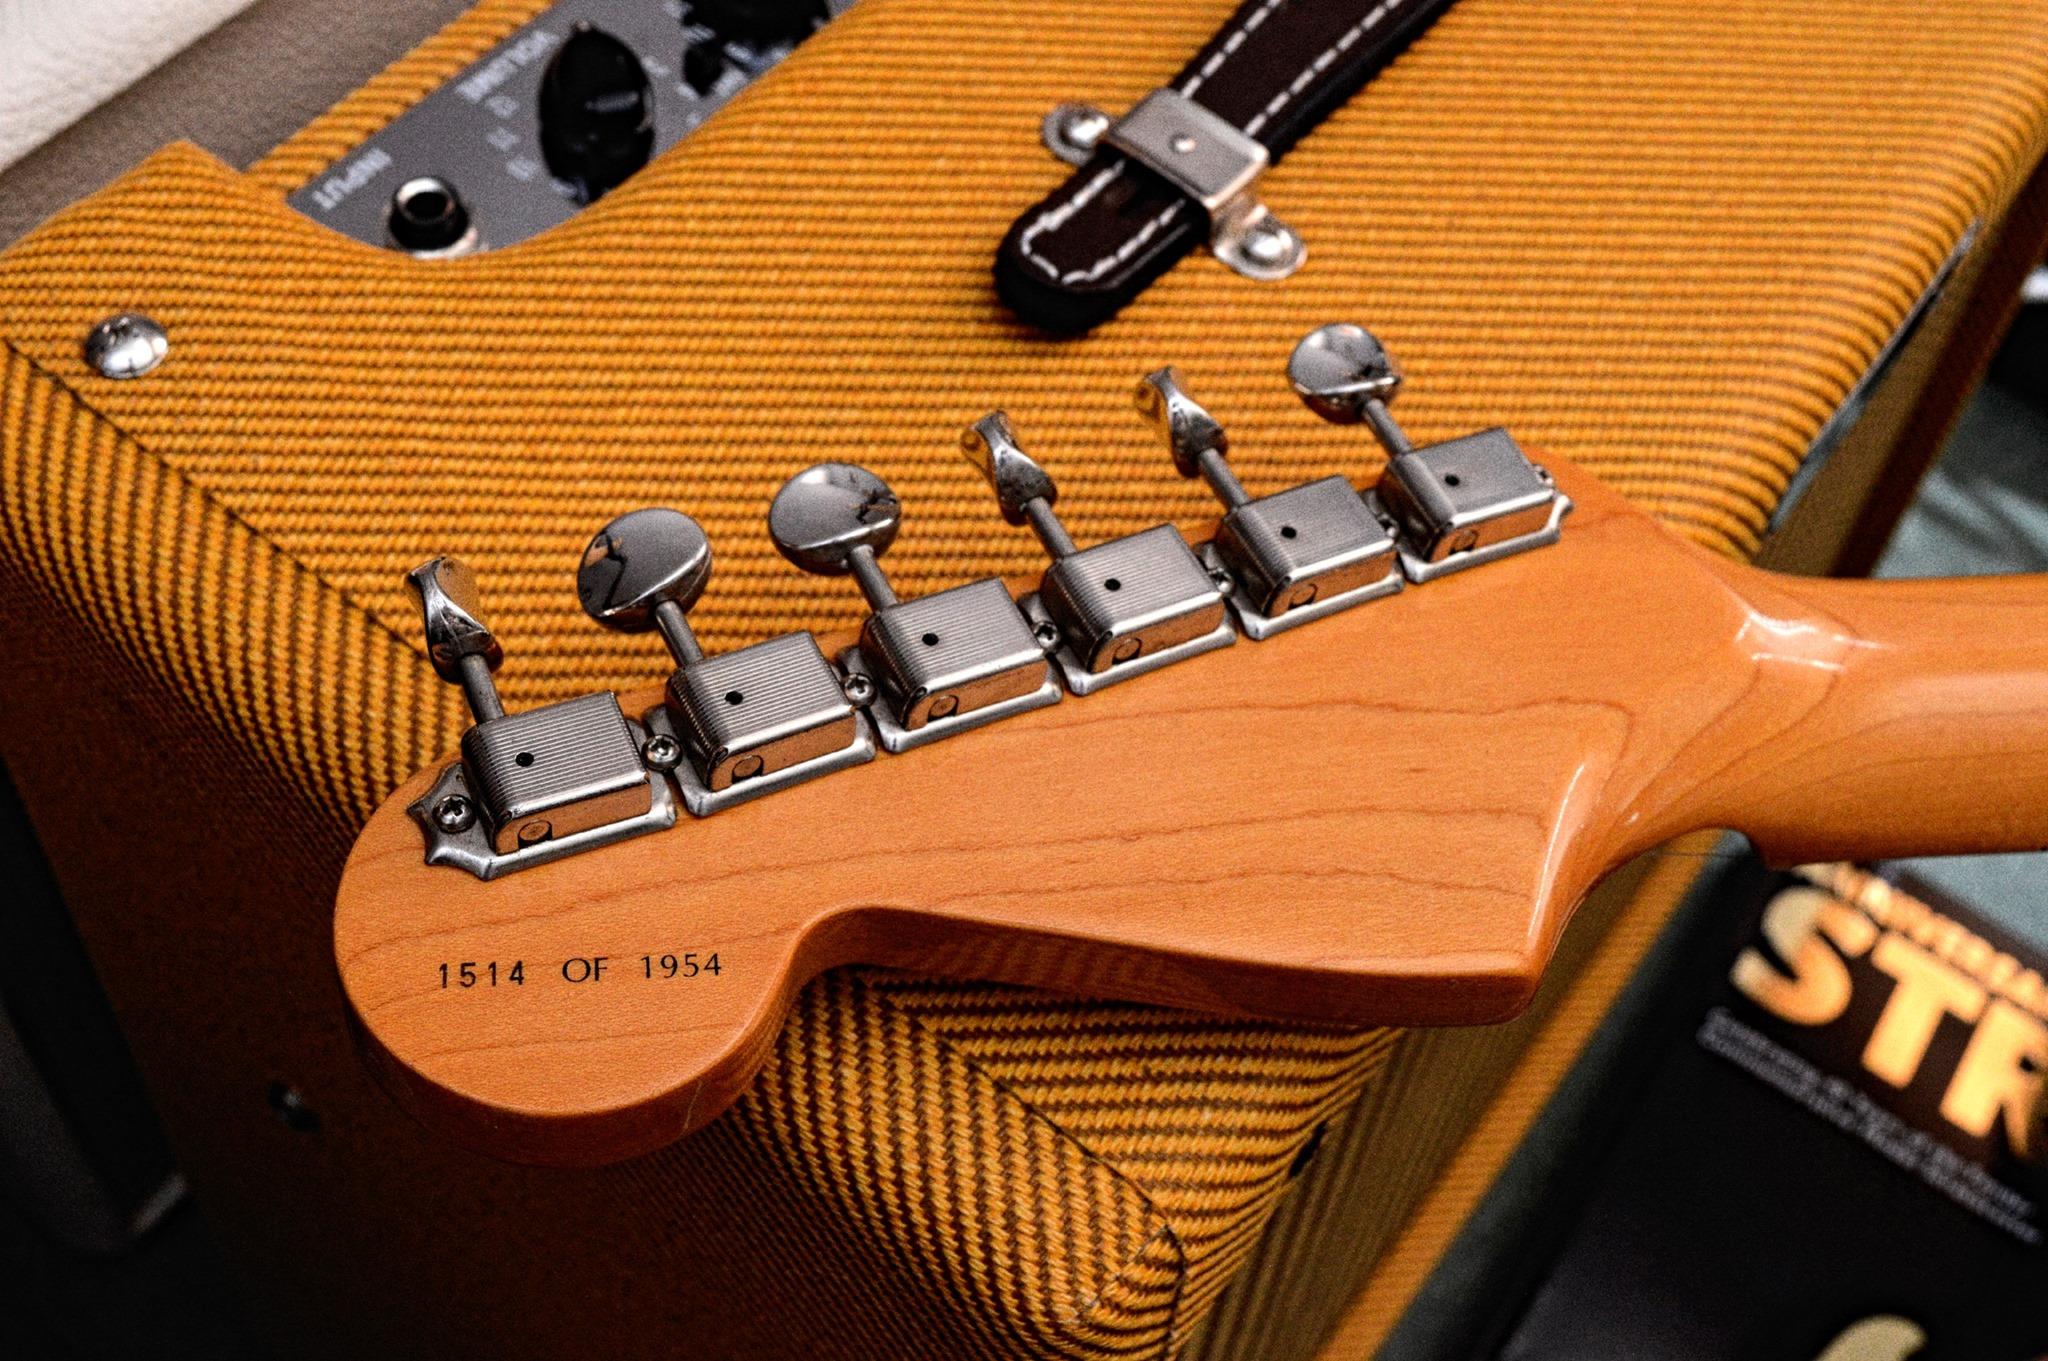 40th Anniversary 1954 Stratocaster headstock